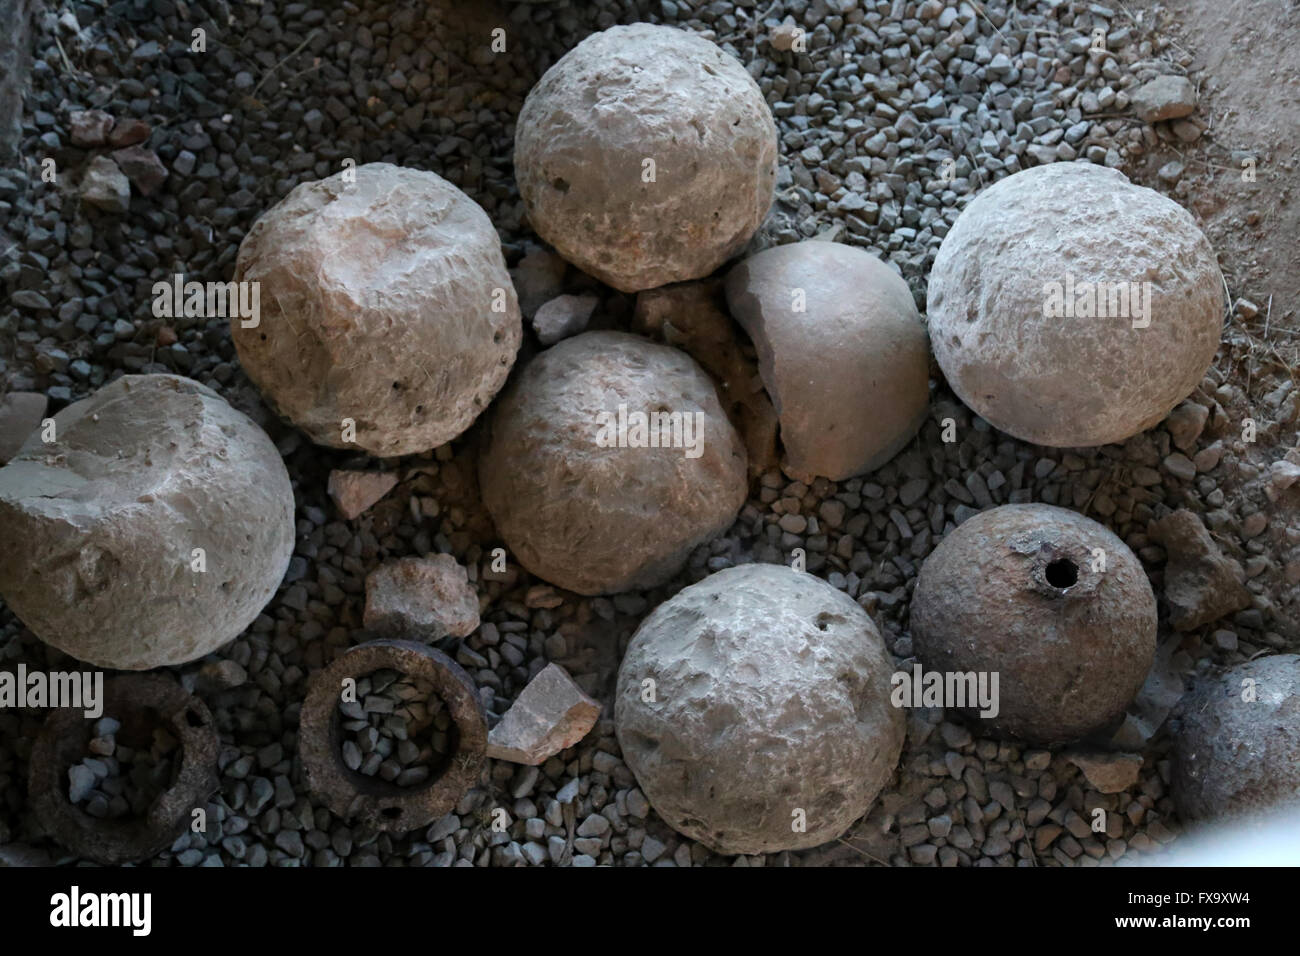 Bombard balls. Stones and iron. Burgos. The Castle. Warehouse of the Museum of Burgos. - Stock Image